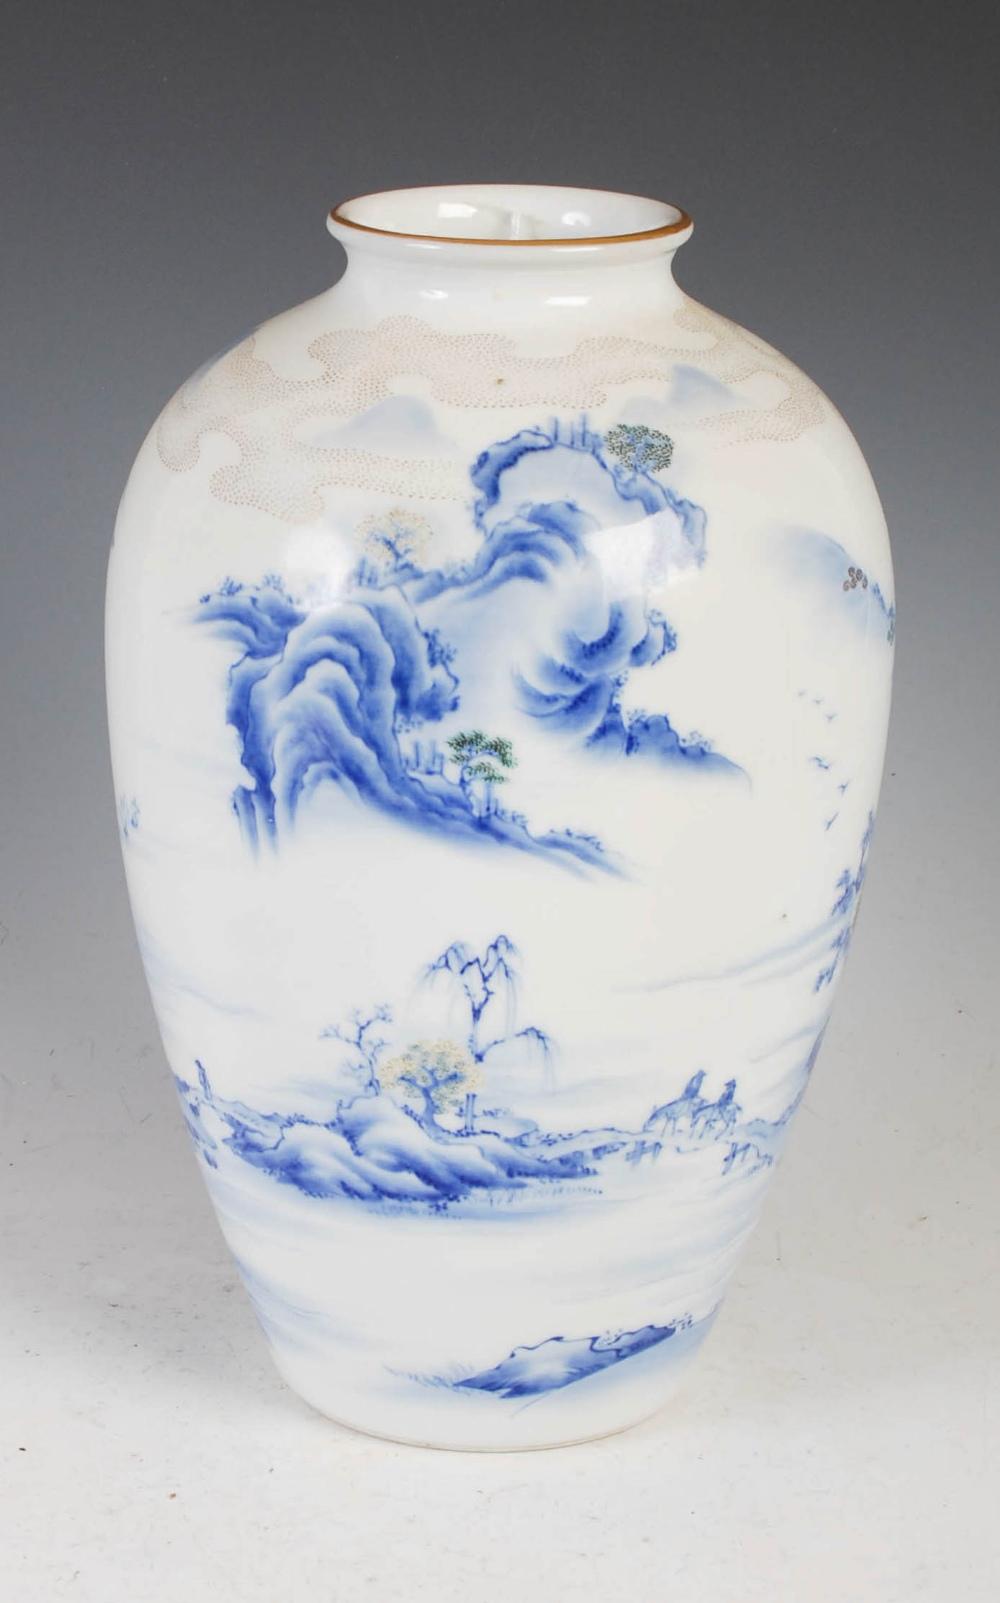 A Japanese Fukagawa porcelain vase, late Meiji/ Taisho Period, decorated with pavilion on a - Image 2 of 4